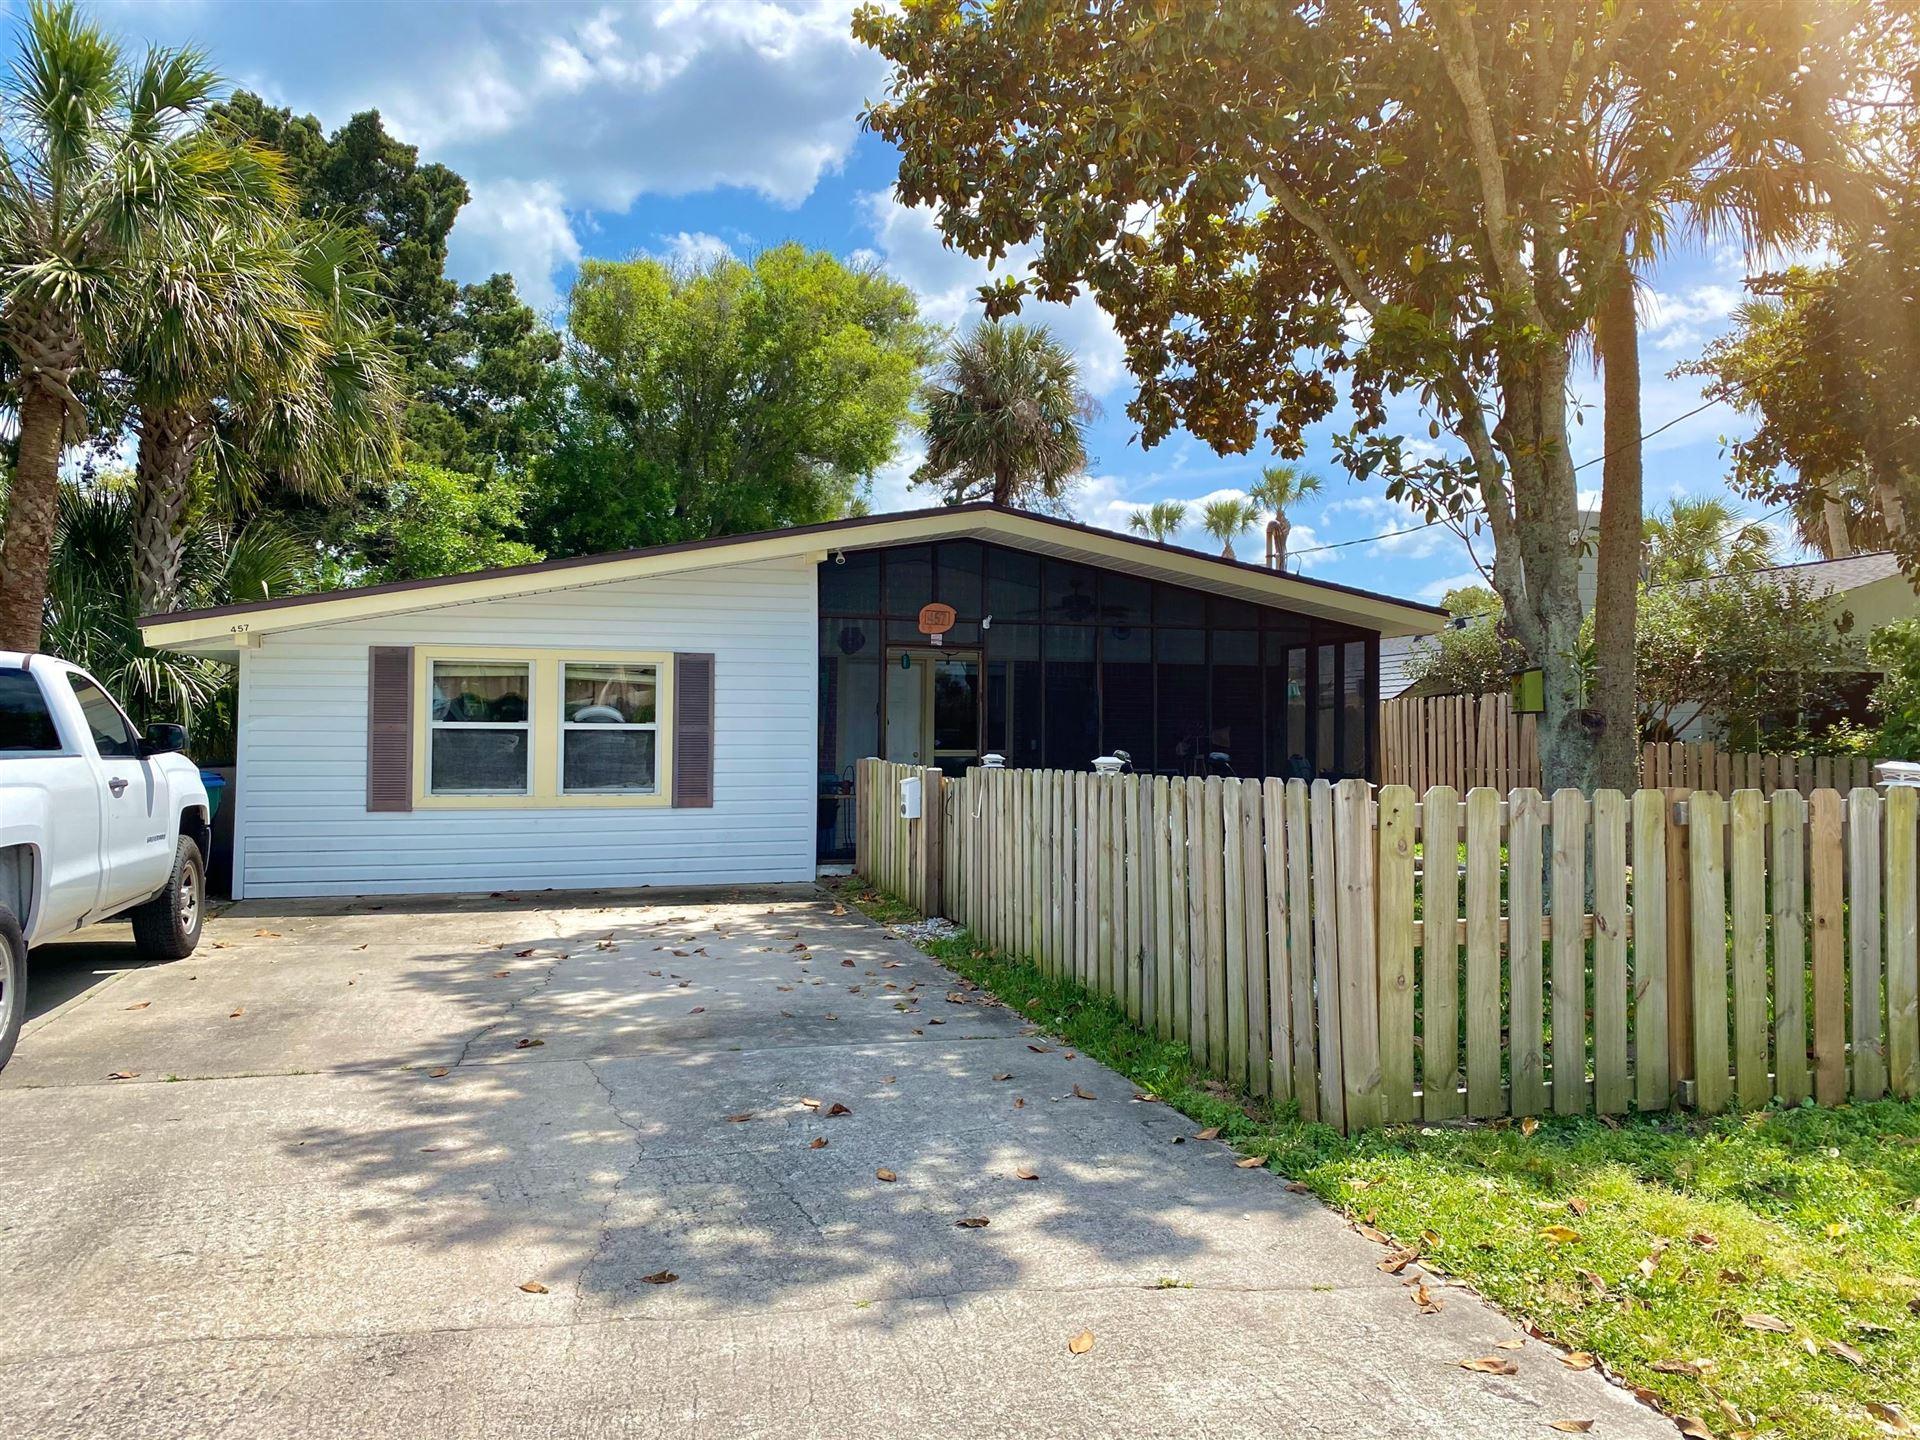 457 LORA ST, Neptune Beach, FL 32266 - MLS#: 1106320